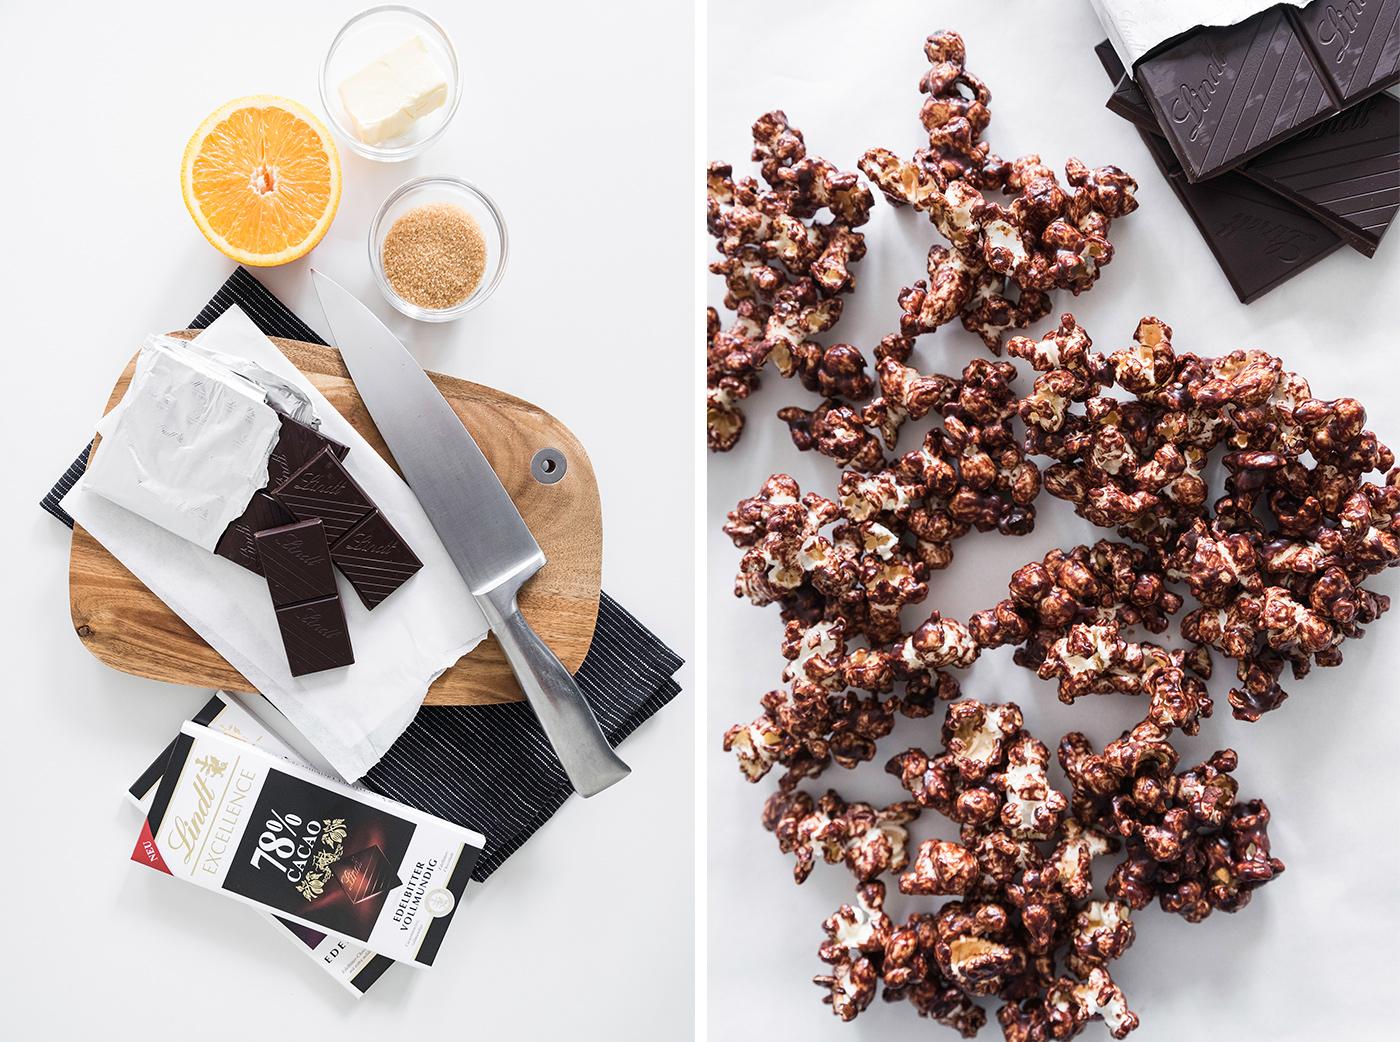 Popcornrezepte - Popcorn mit Schokoladenglasur